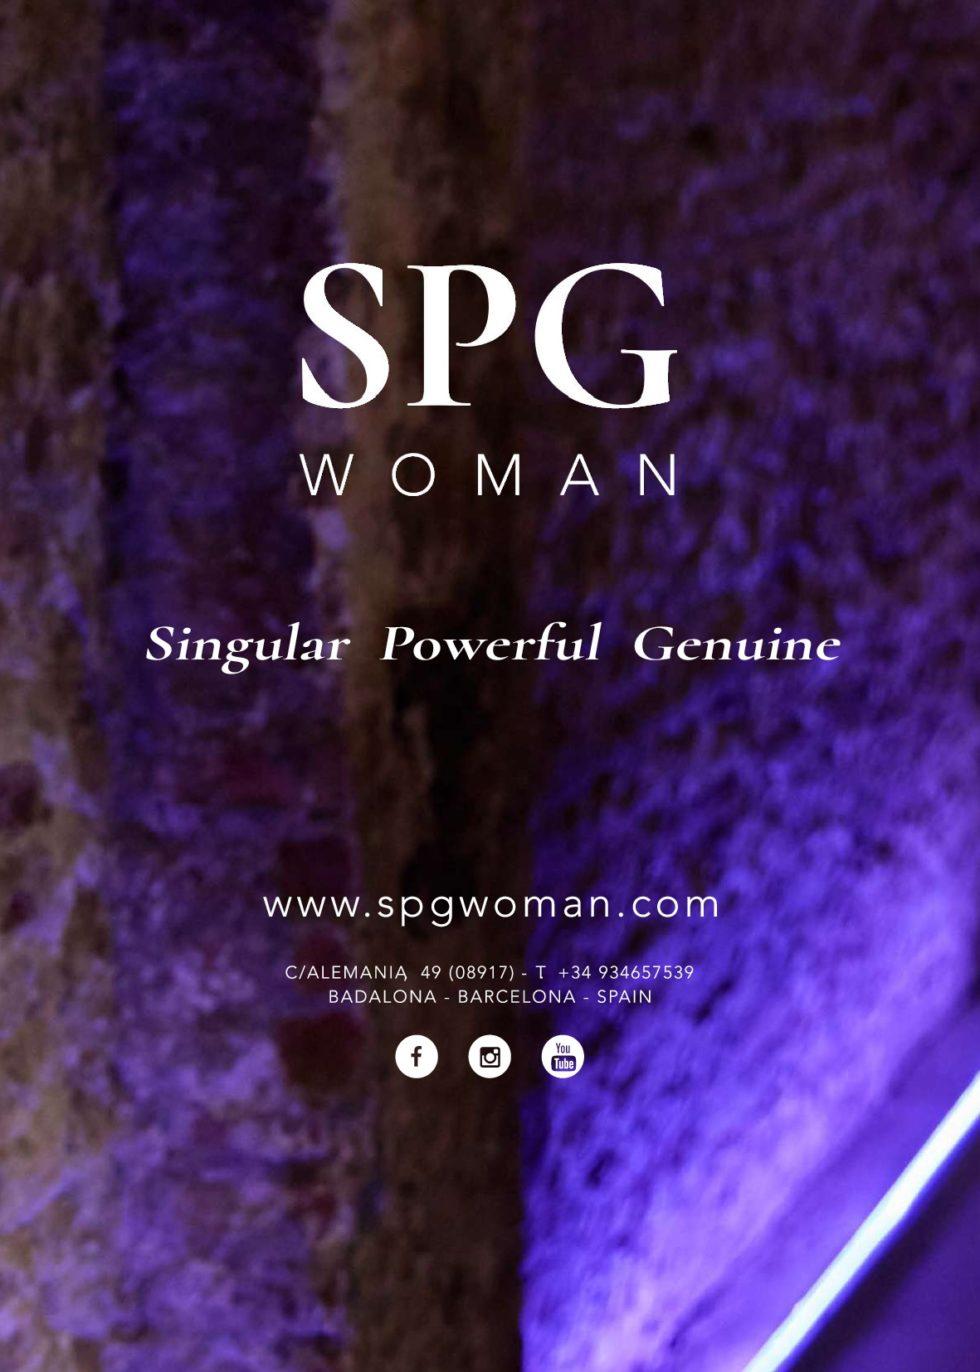 SPGWoman_web_OI21_compressed-032